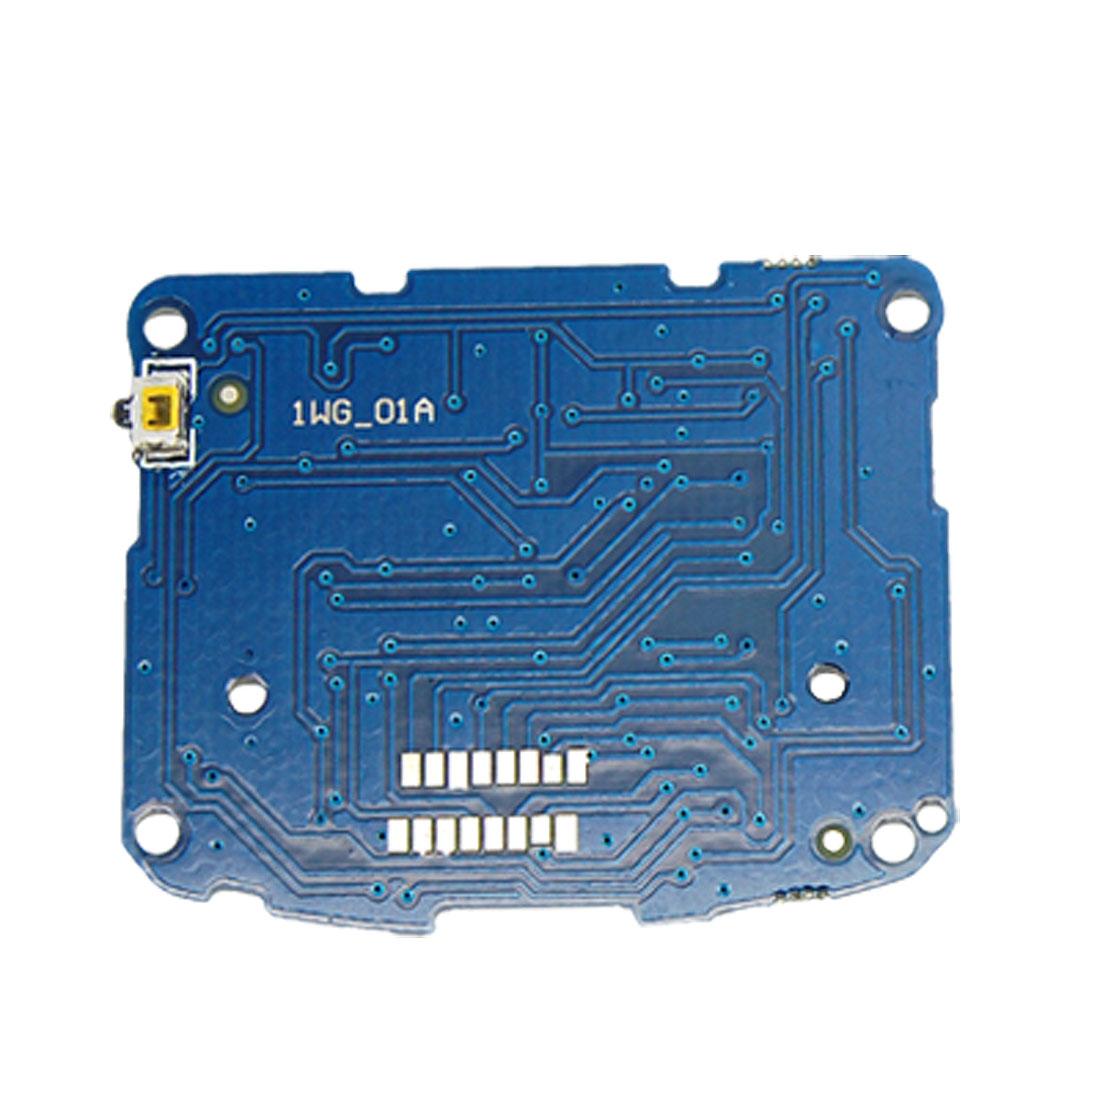 Repair Part Keypad Board Keyboard Membrane for Nokia N72